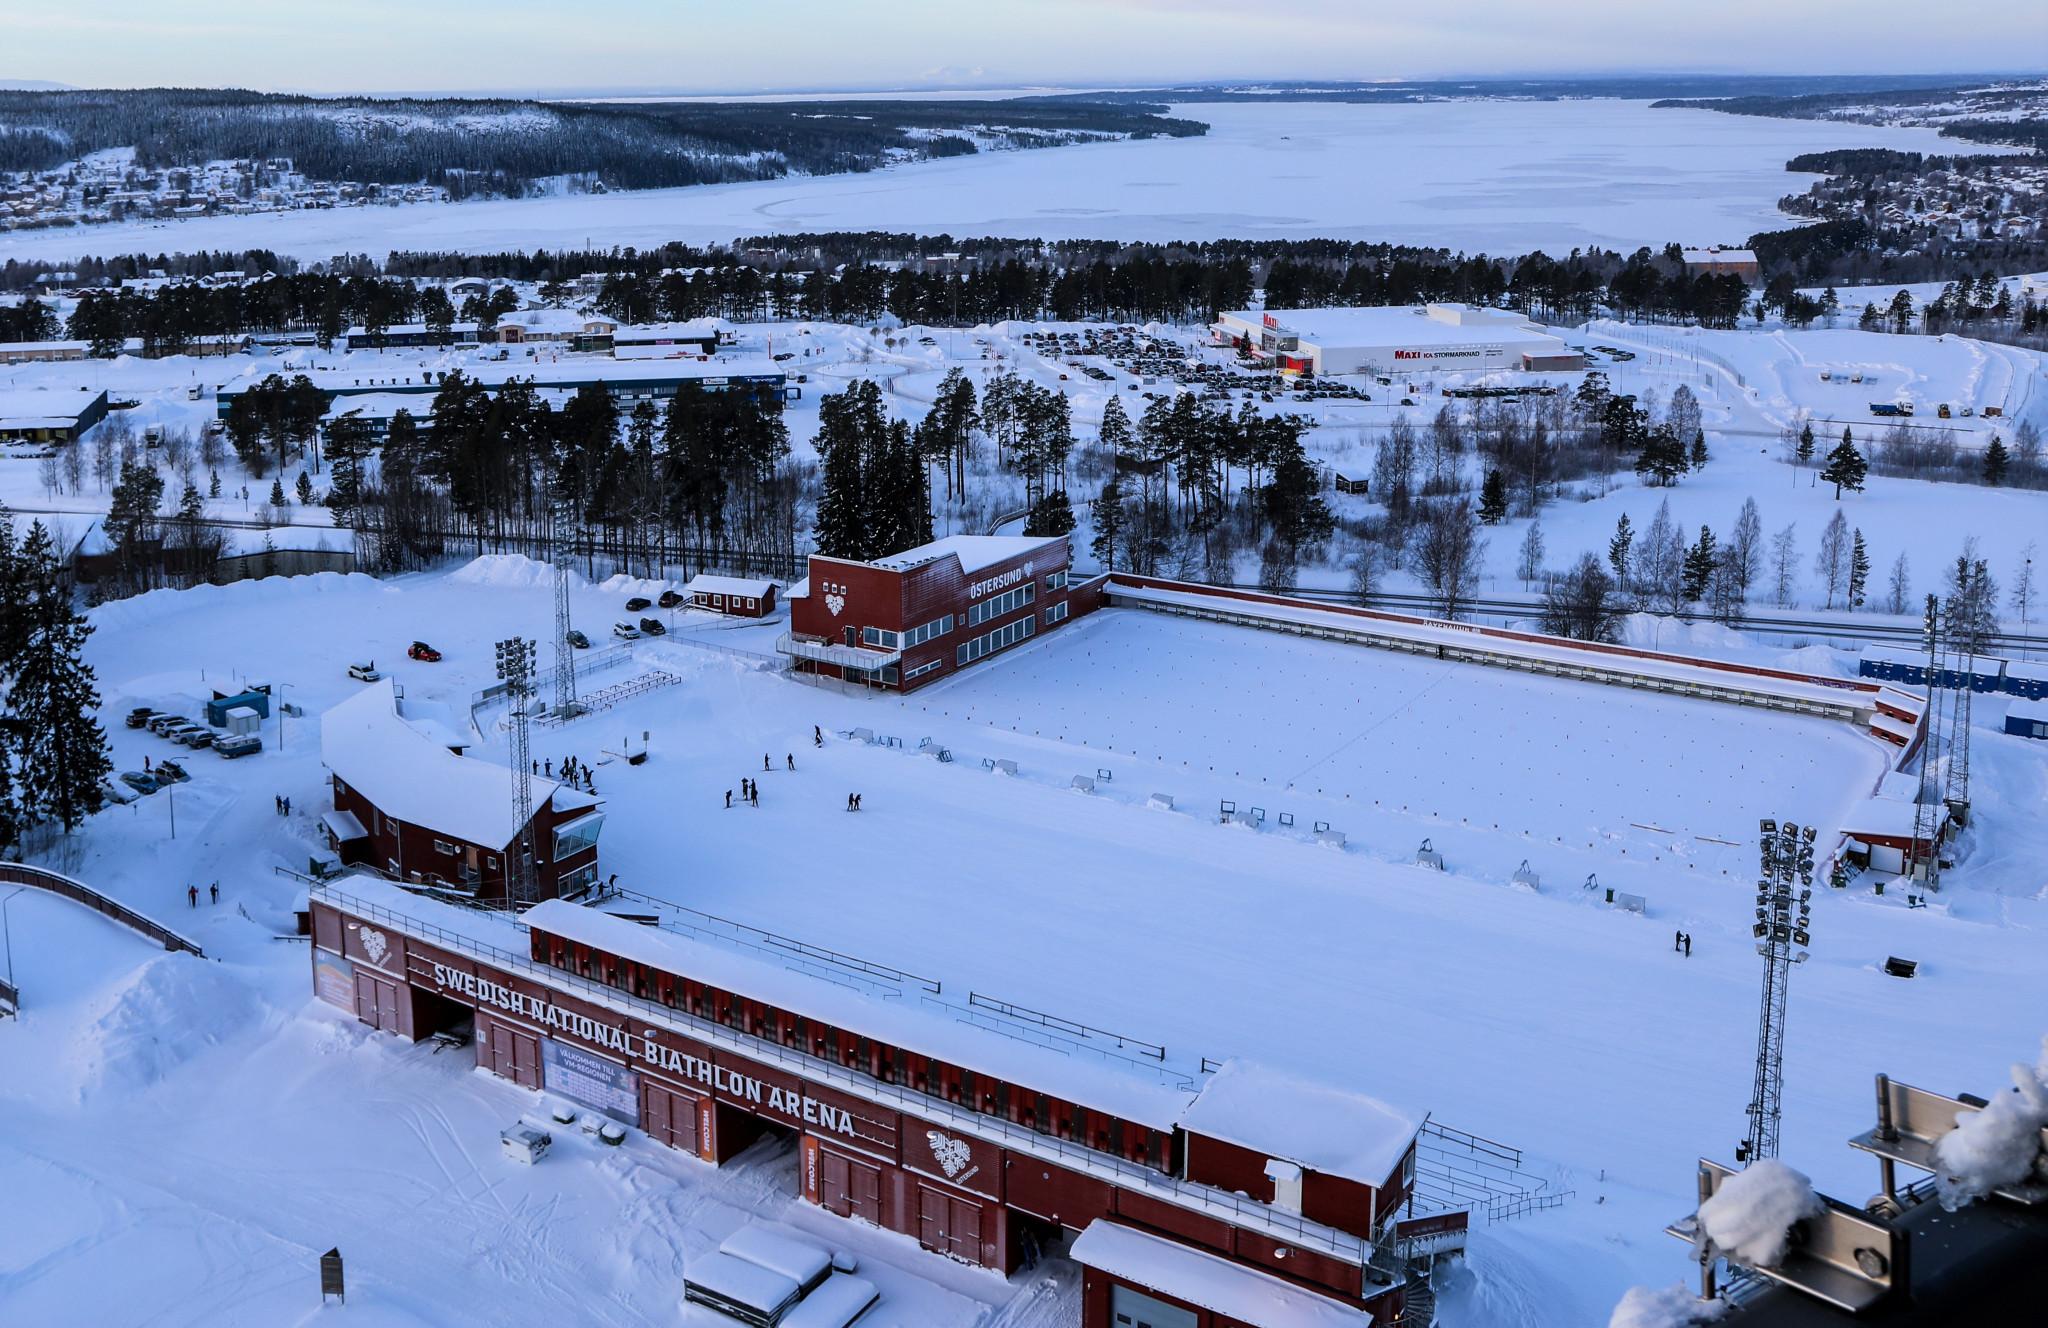 The Swedish National Biathlon Arena in Östersund ©Karl Nilsson